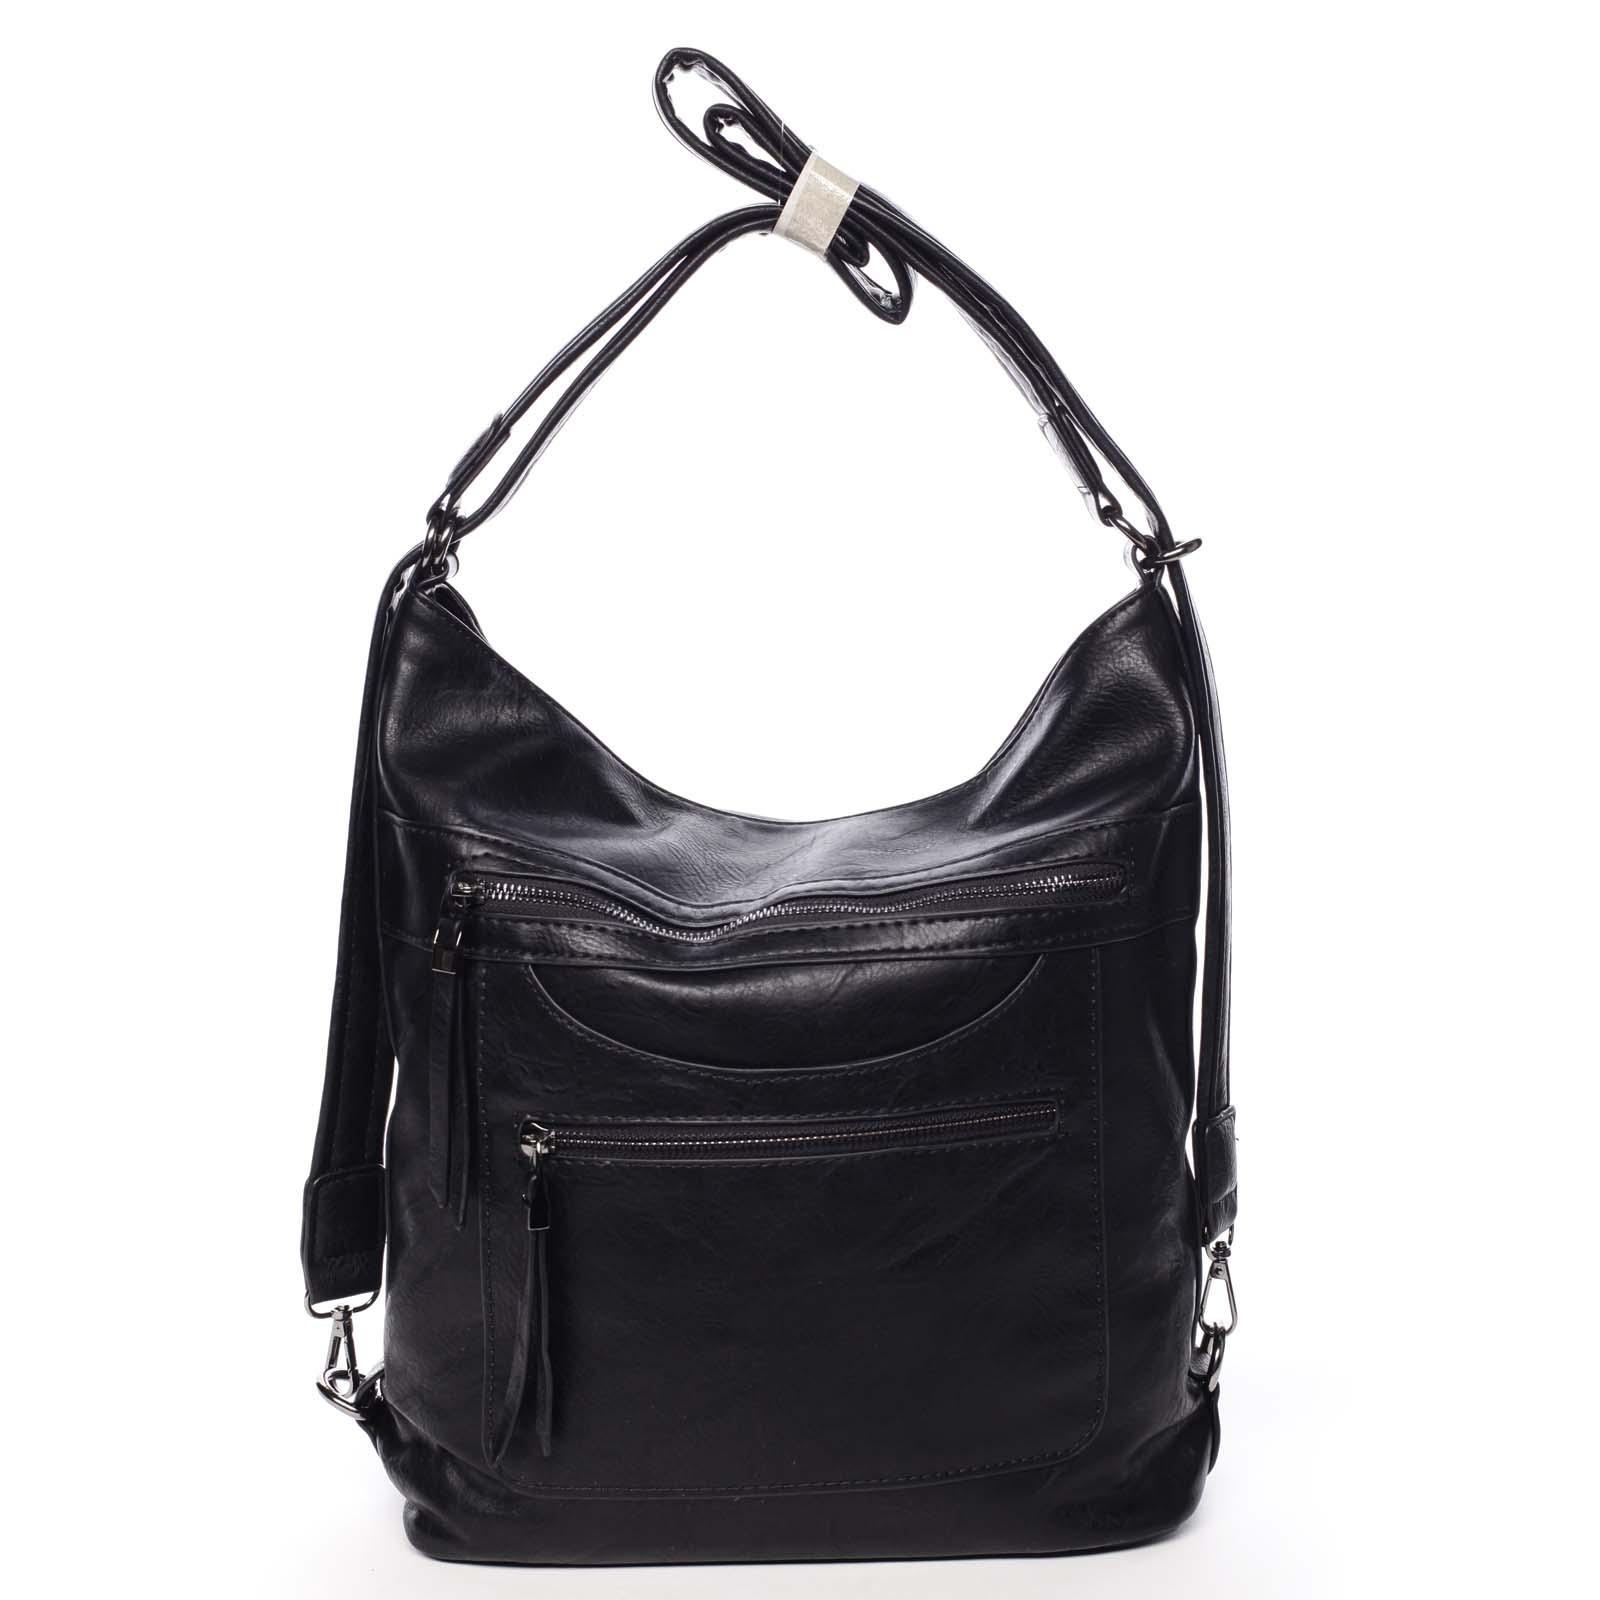 Dámska kabelka čierna - Romina Pamila čierna